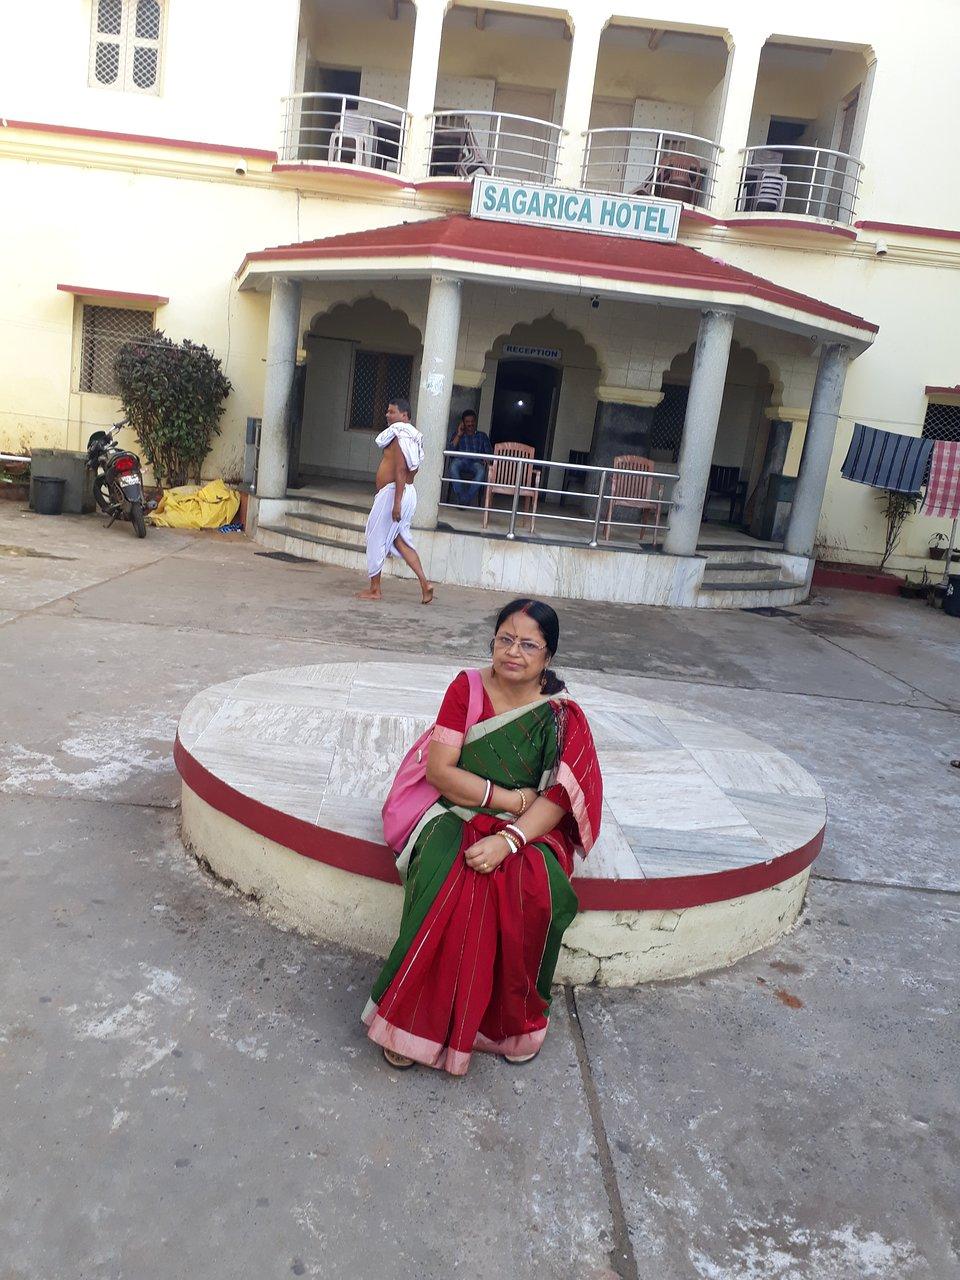 SAGARIKA HOTEL (Puri, Odisha) - Hotel Reviews, Photos, Rate